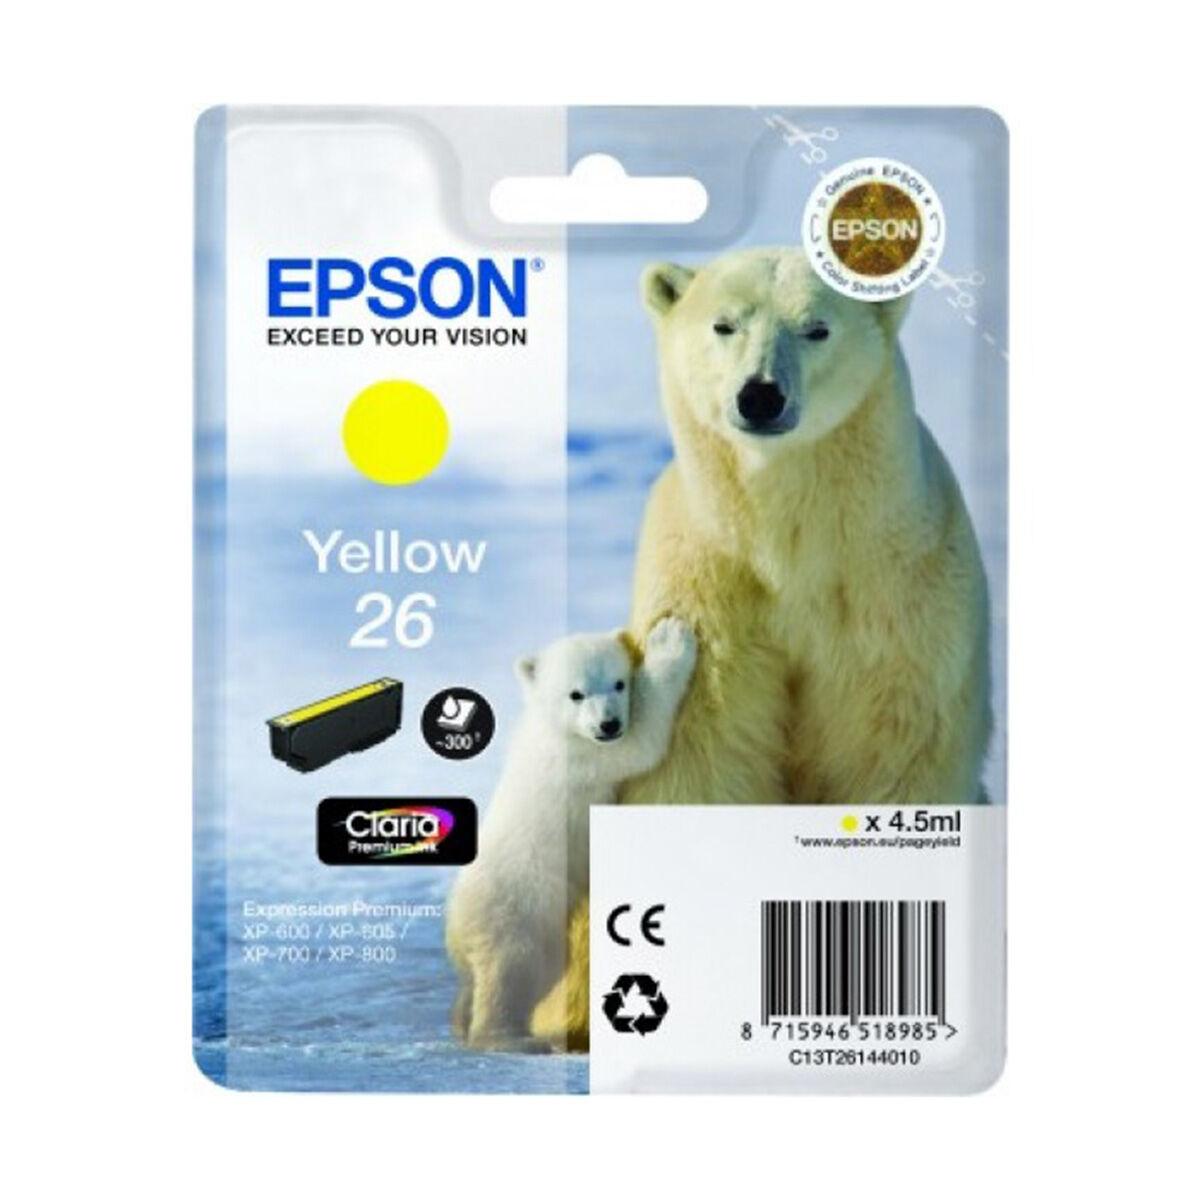 Cartouche Imprimante Epson «ours Polaire» - N°26 Jaune